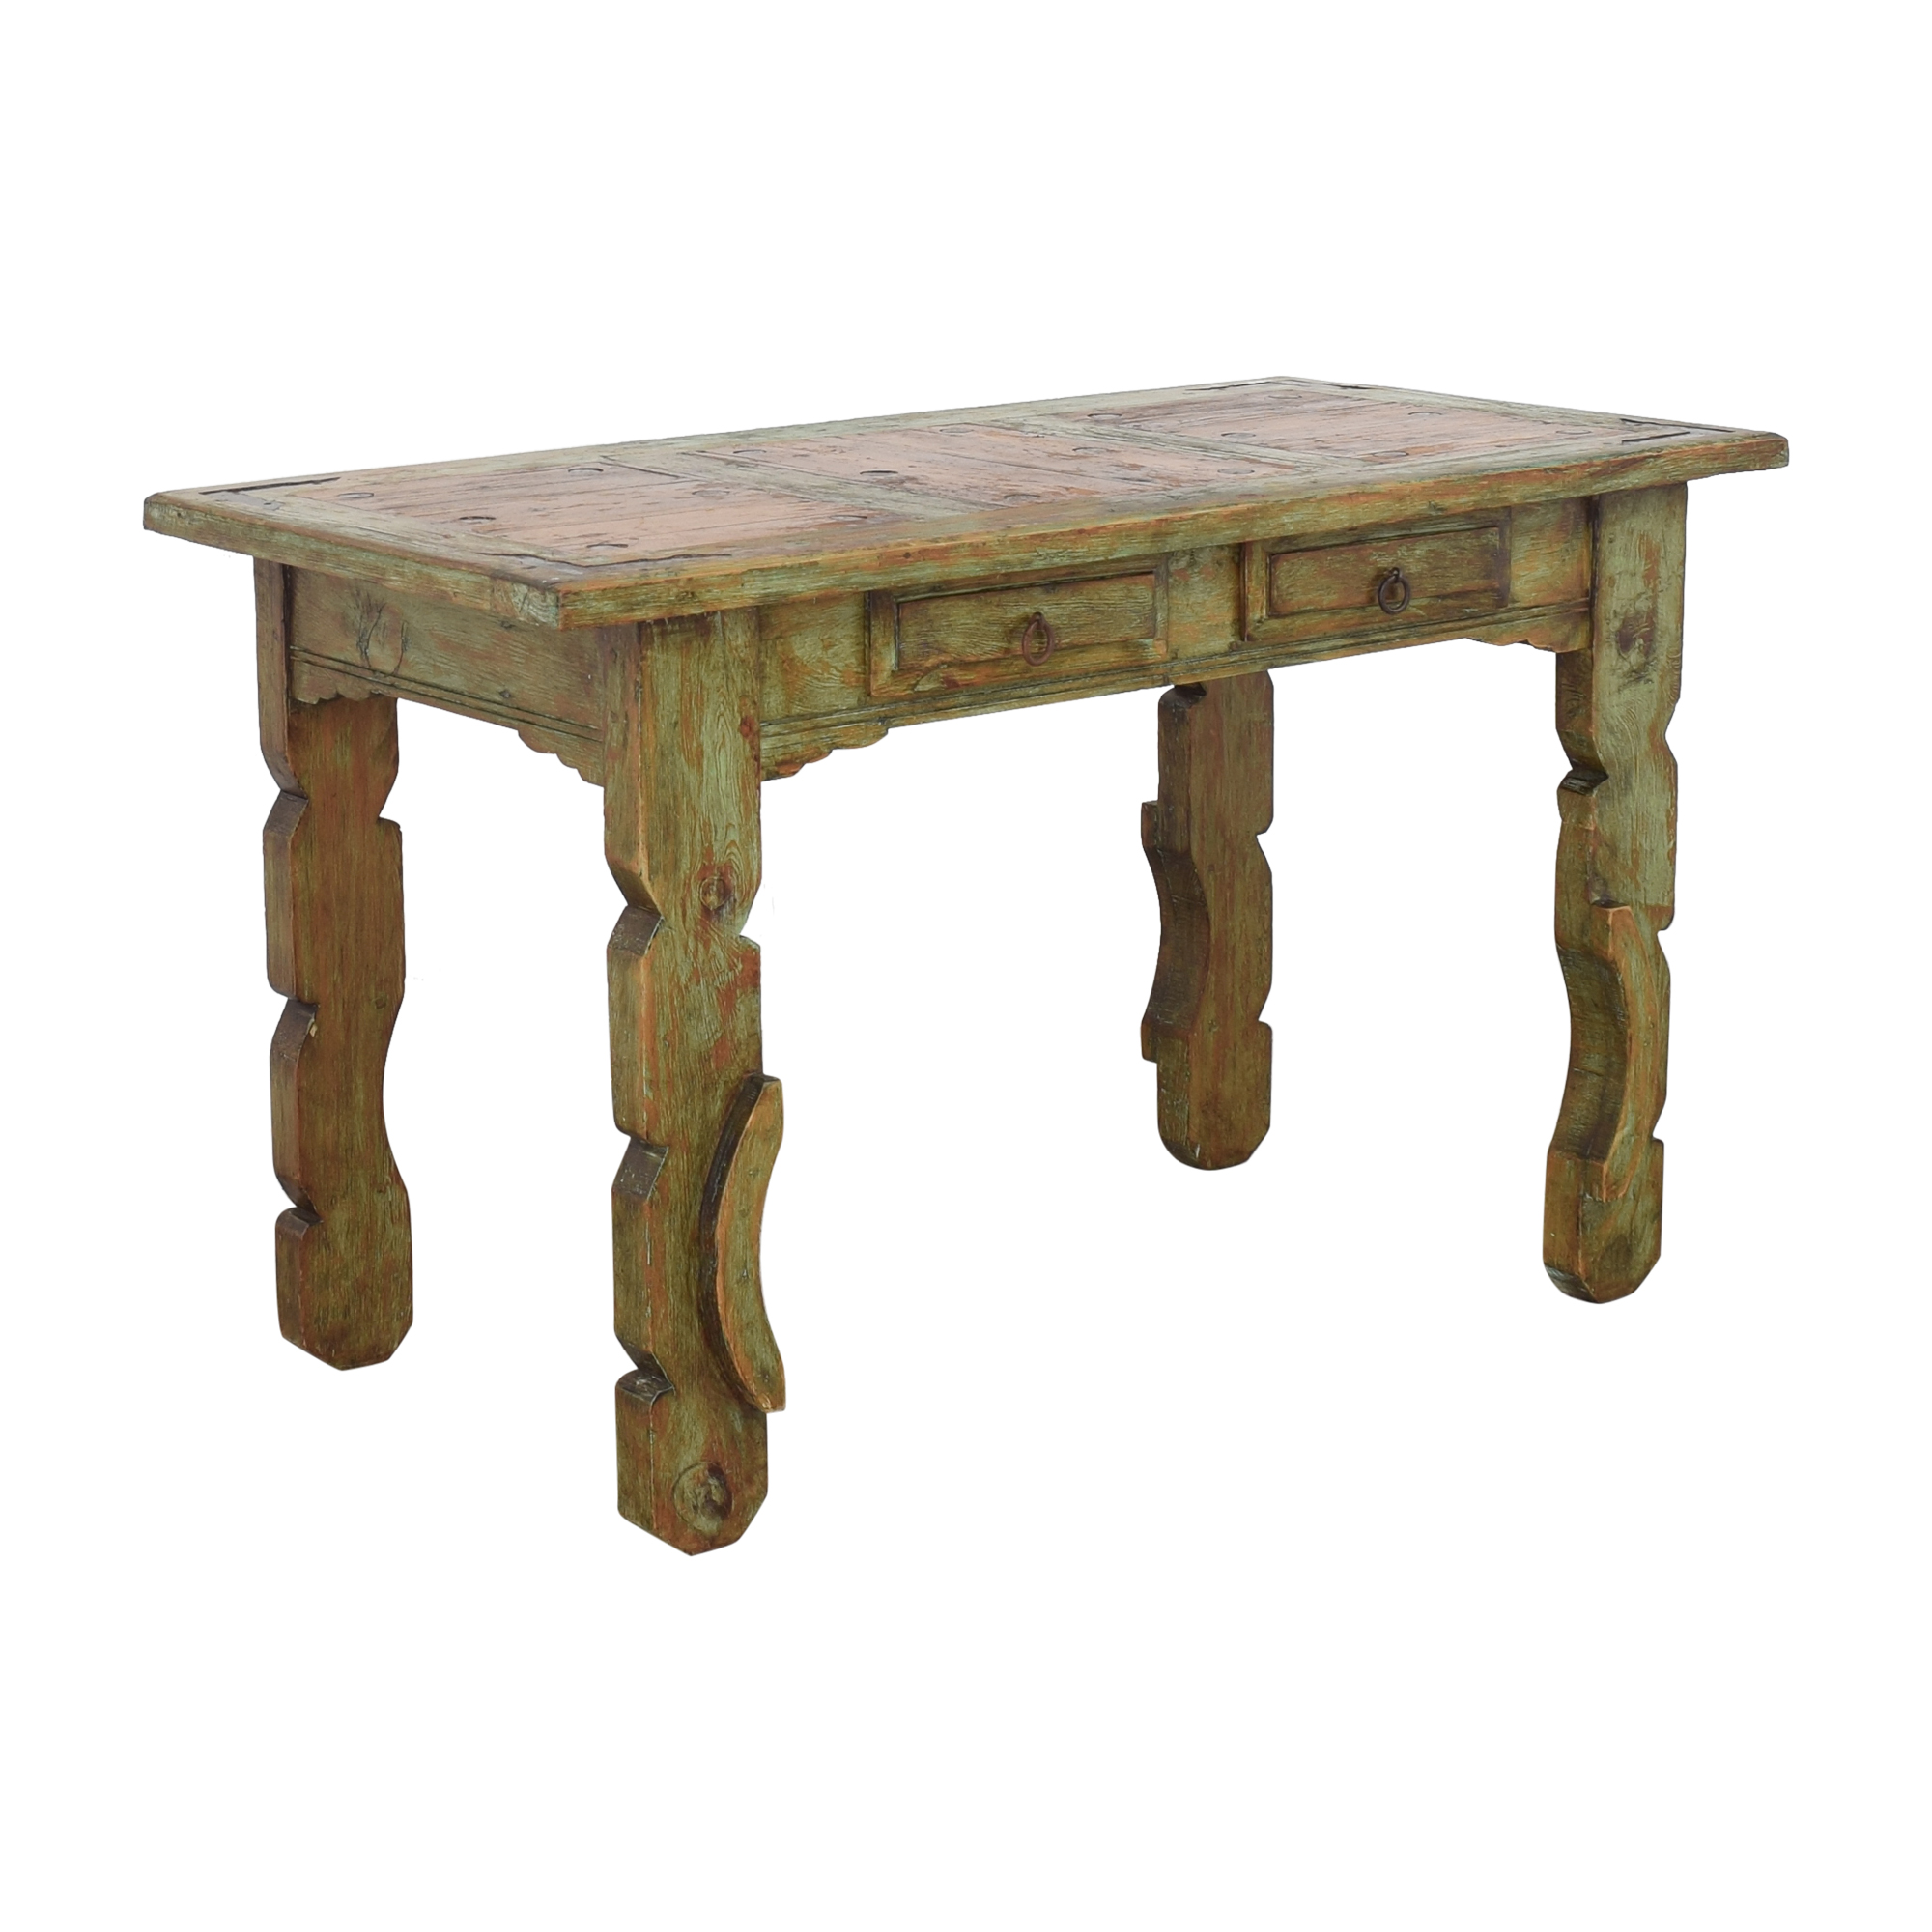 shop El Barzon Rustic Furniture El Barzon Rustic Furniture Reclaimed Dining Table  online